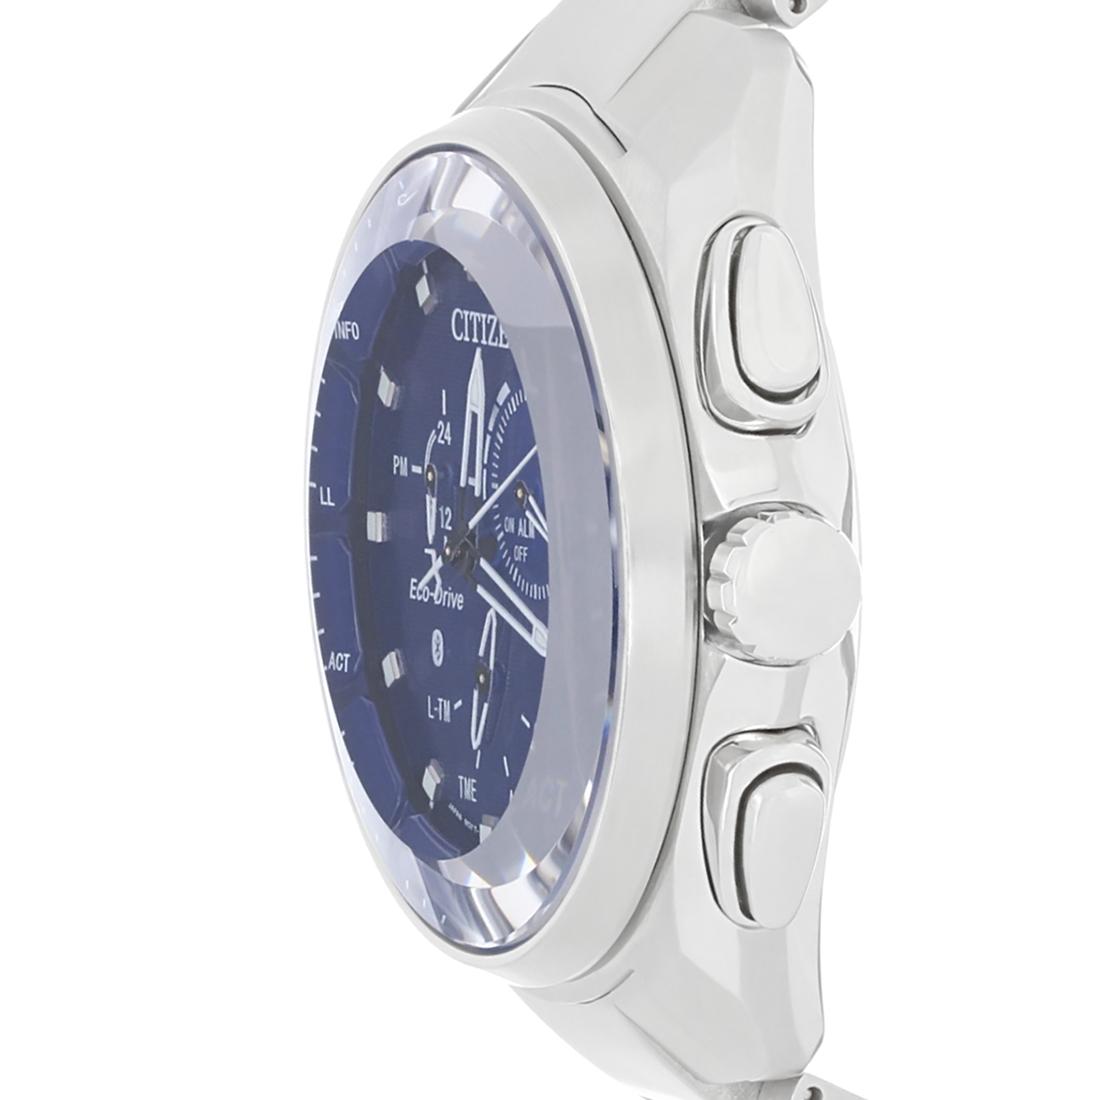 CITIZEN Proximity Pryzm Bluetooth Blue Dial Men's Watch - $189